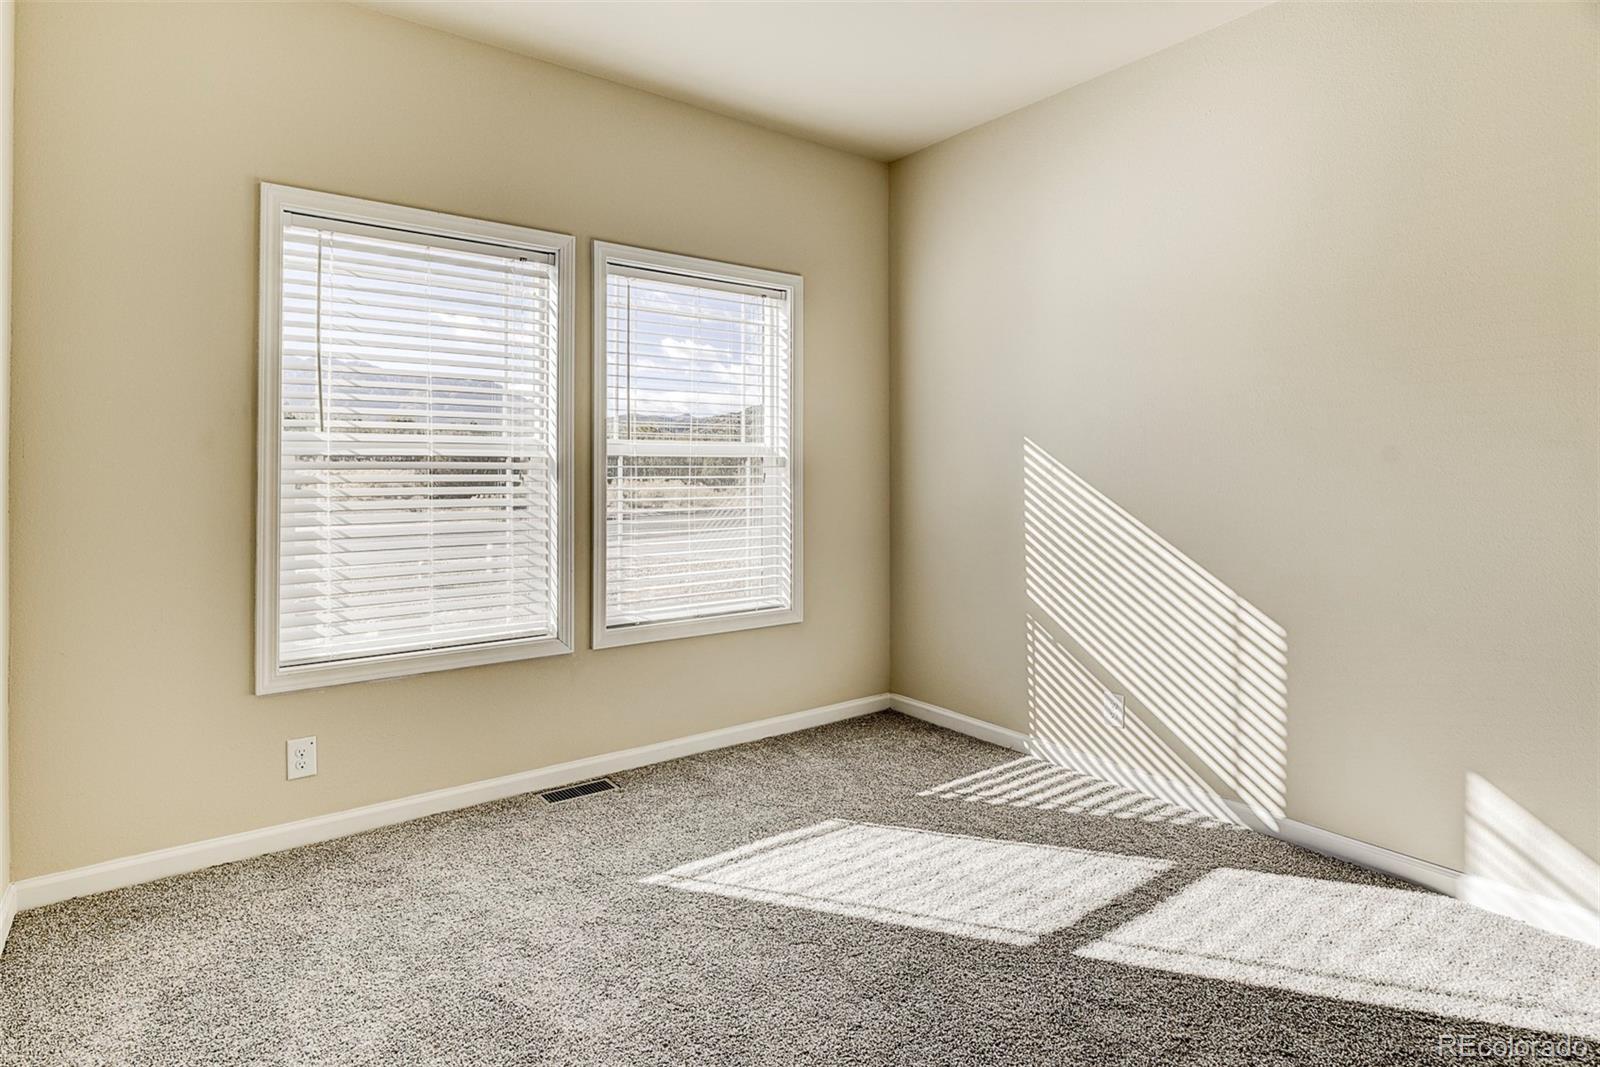 MLS# 7338899 - 30 - 964 Purcell Place, Pueblo West, CO 81007